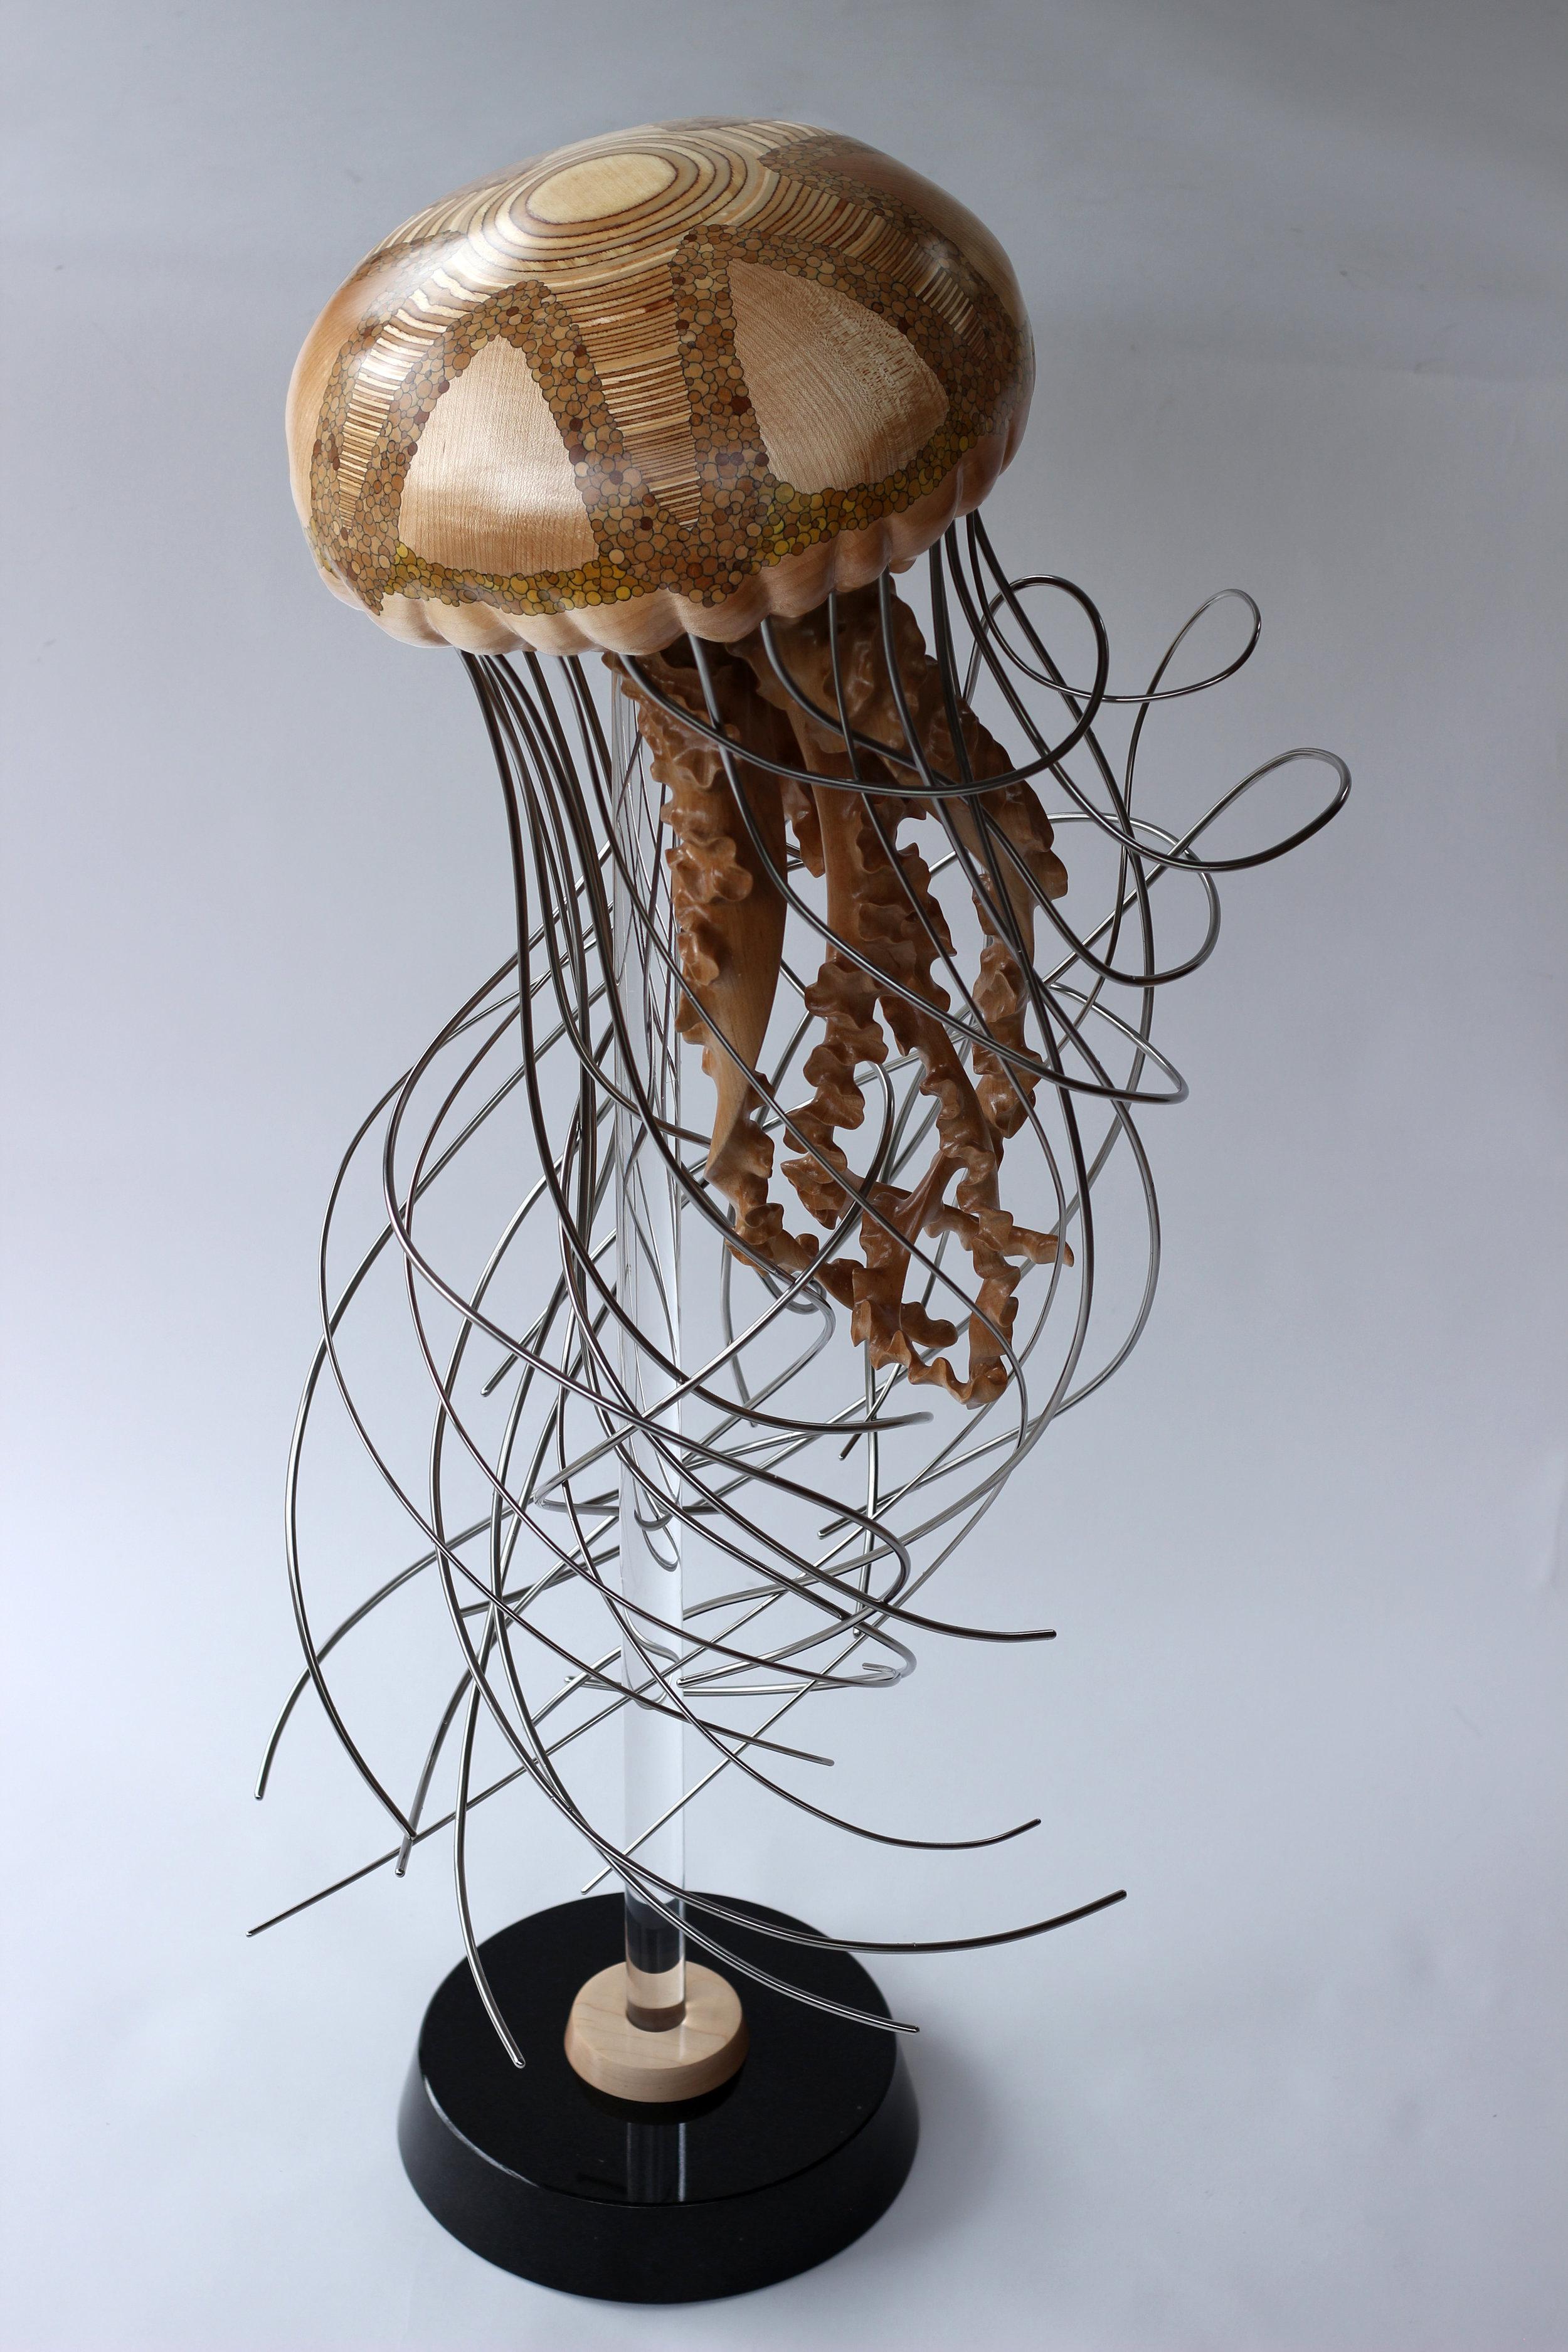 Jellyfish #5 by Sam Hingston